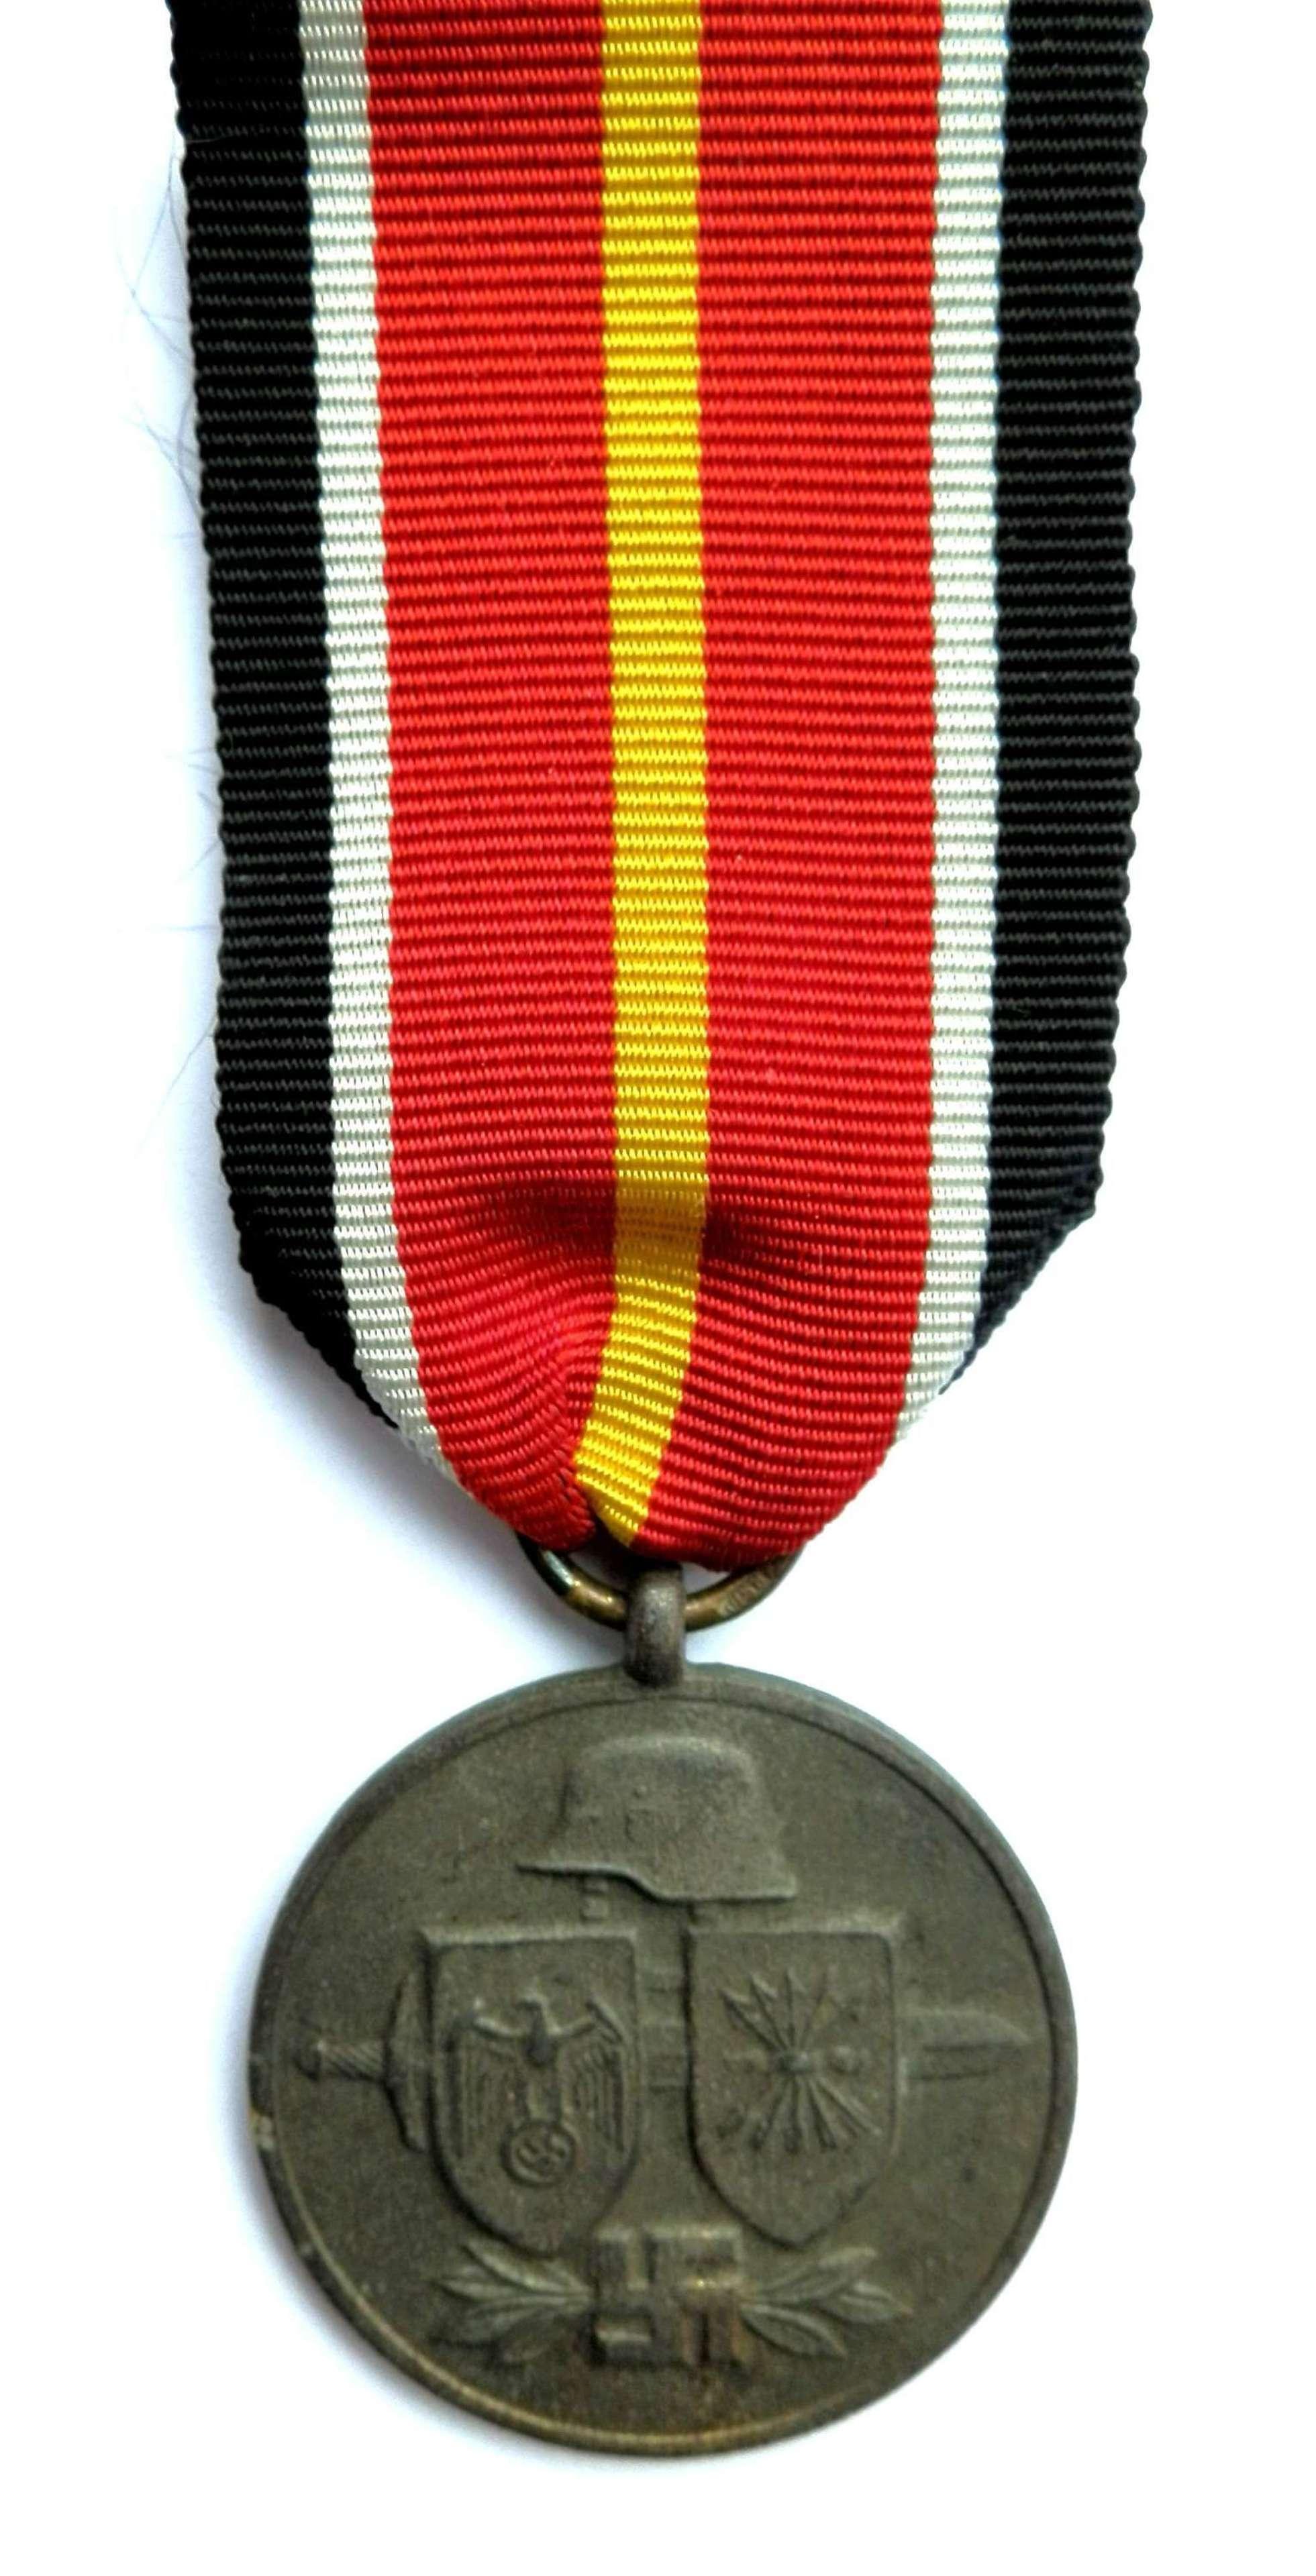 Spanish Blue Division Medal.